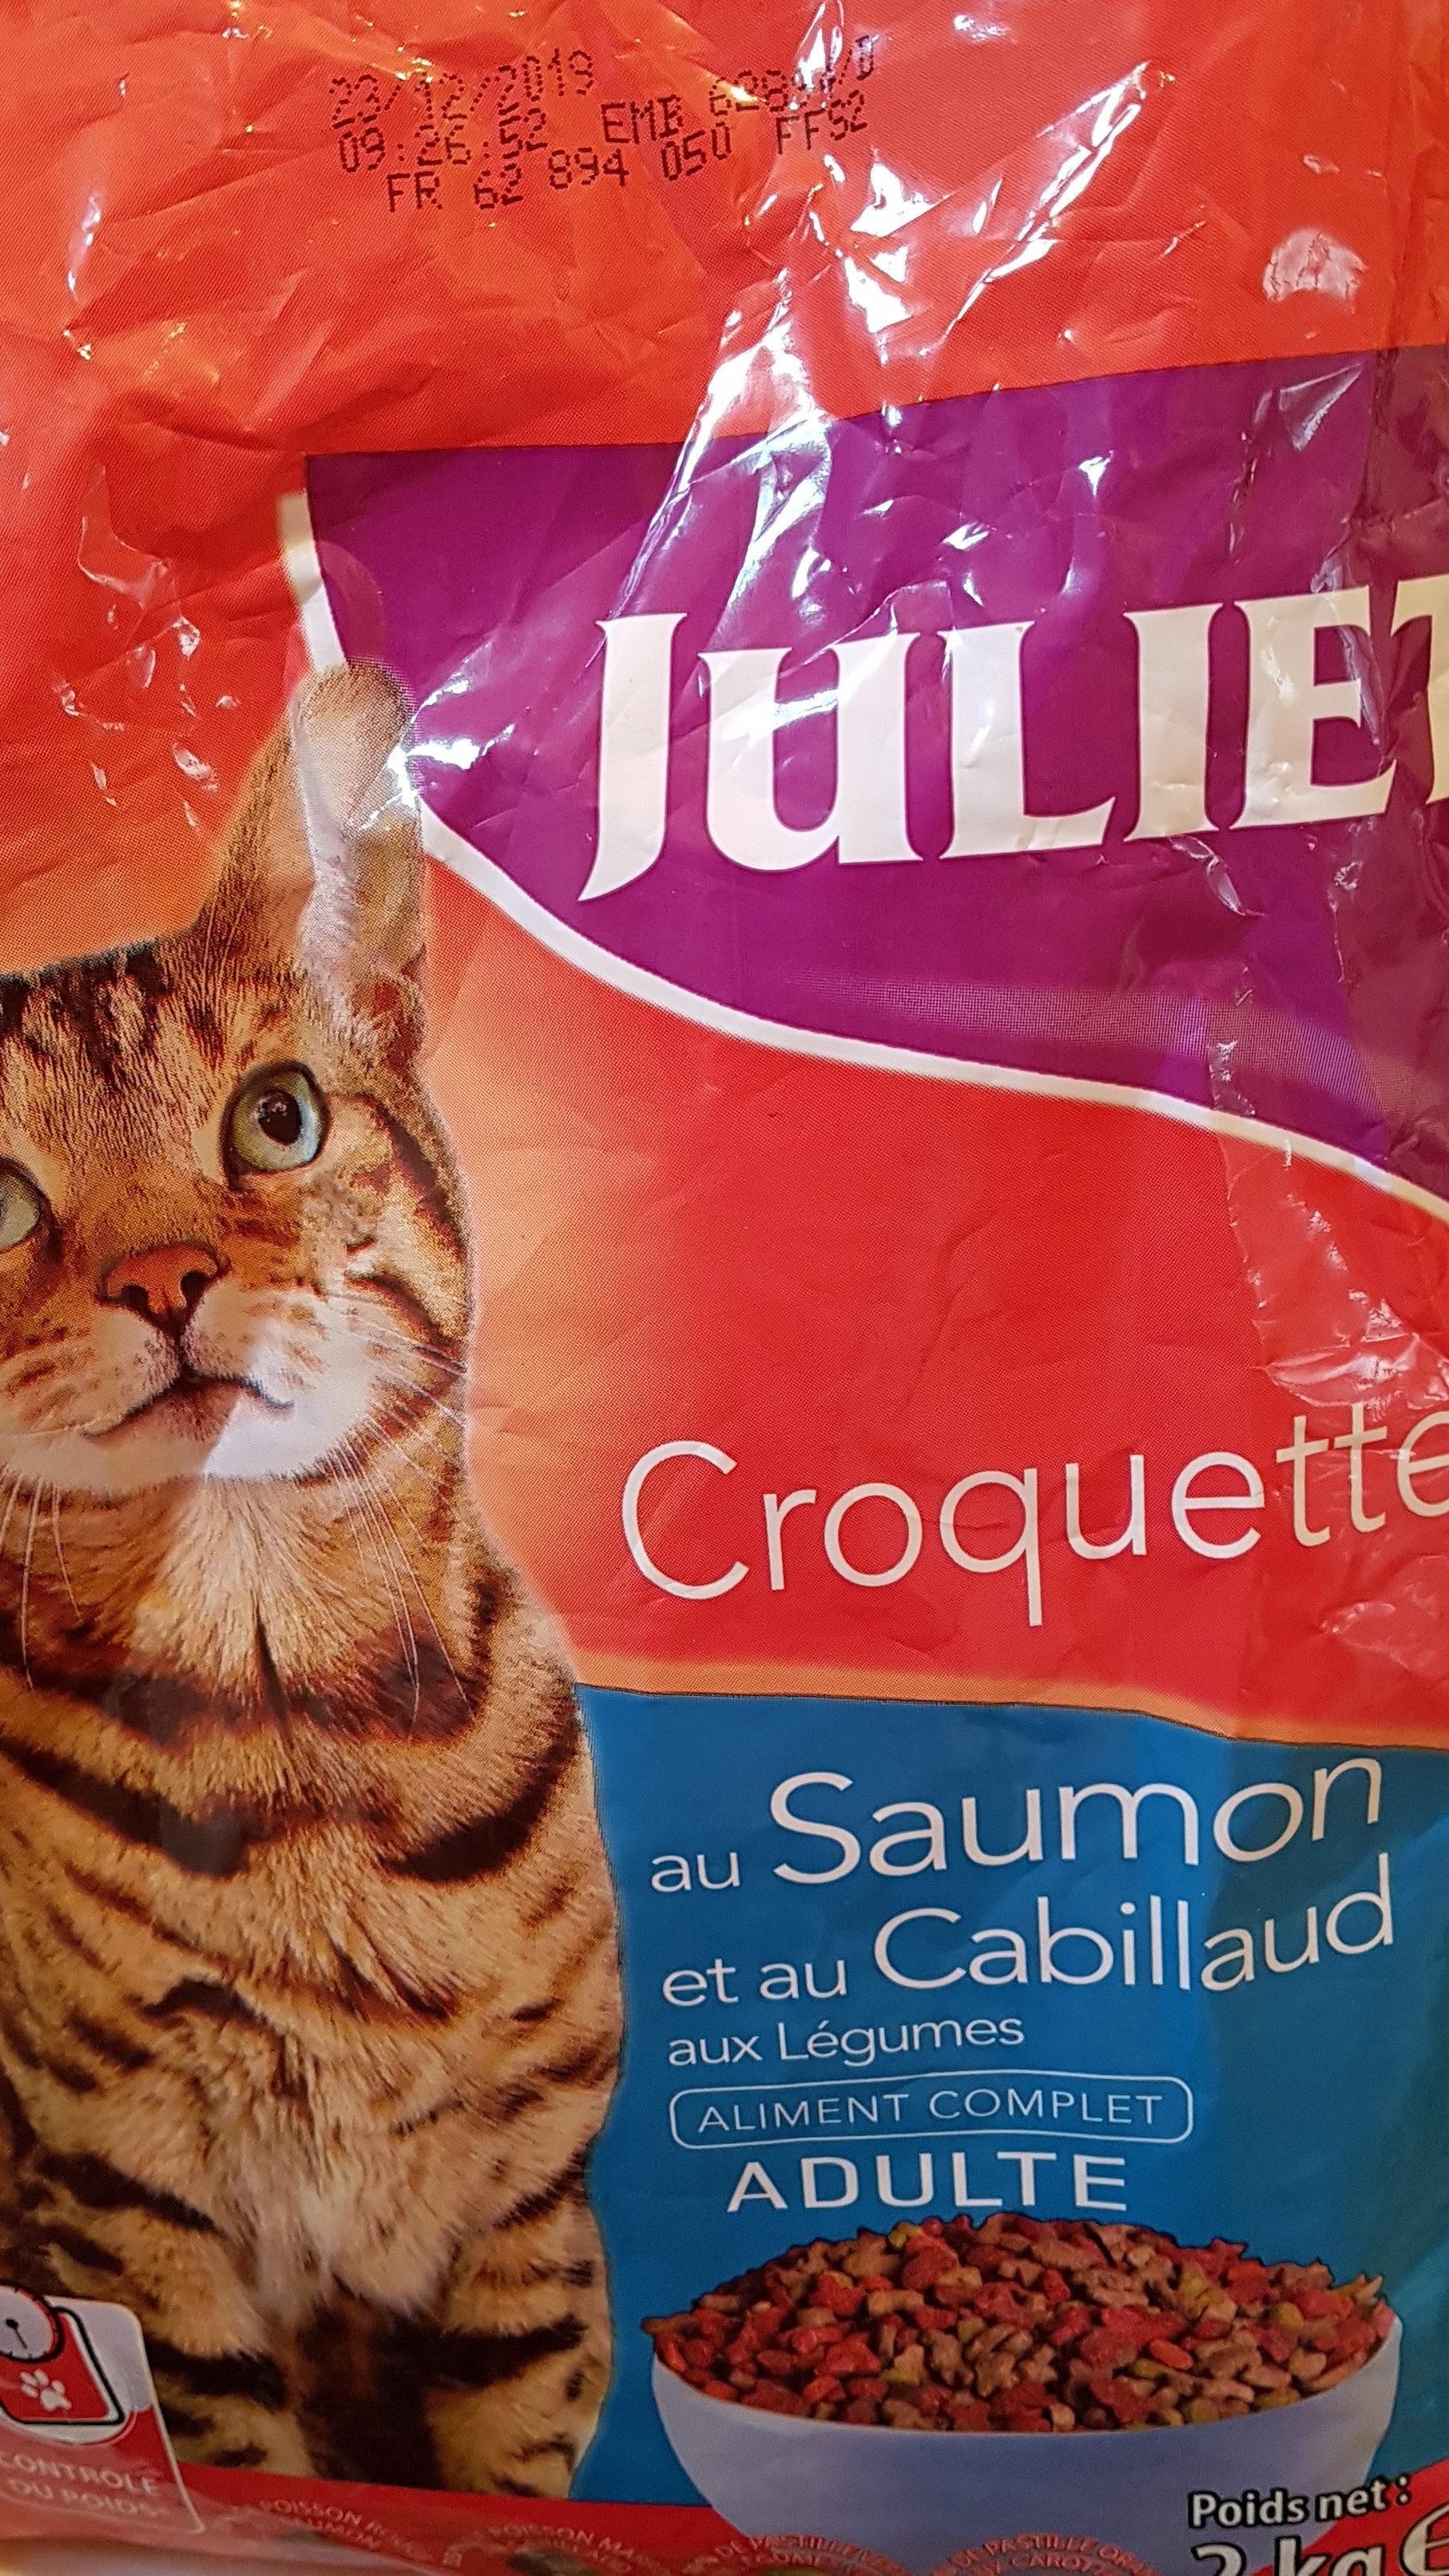 Julie croquettes saumon cabillaud - Product